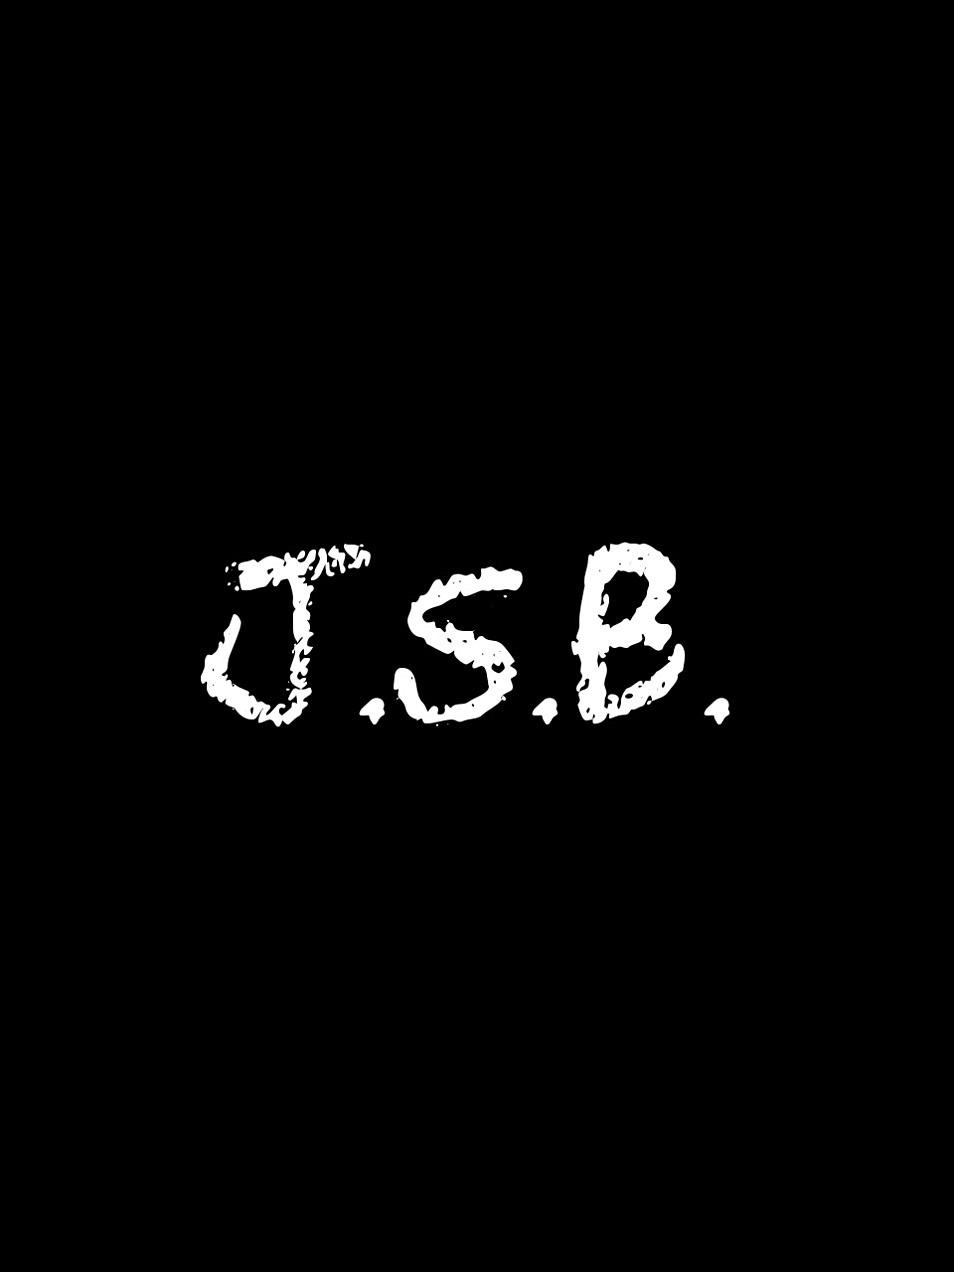 J S B 壁紙 完全無料画像検索のプリ画像 Bygmo